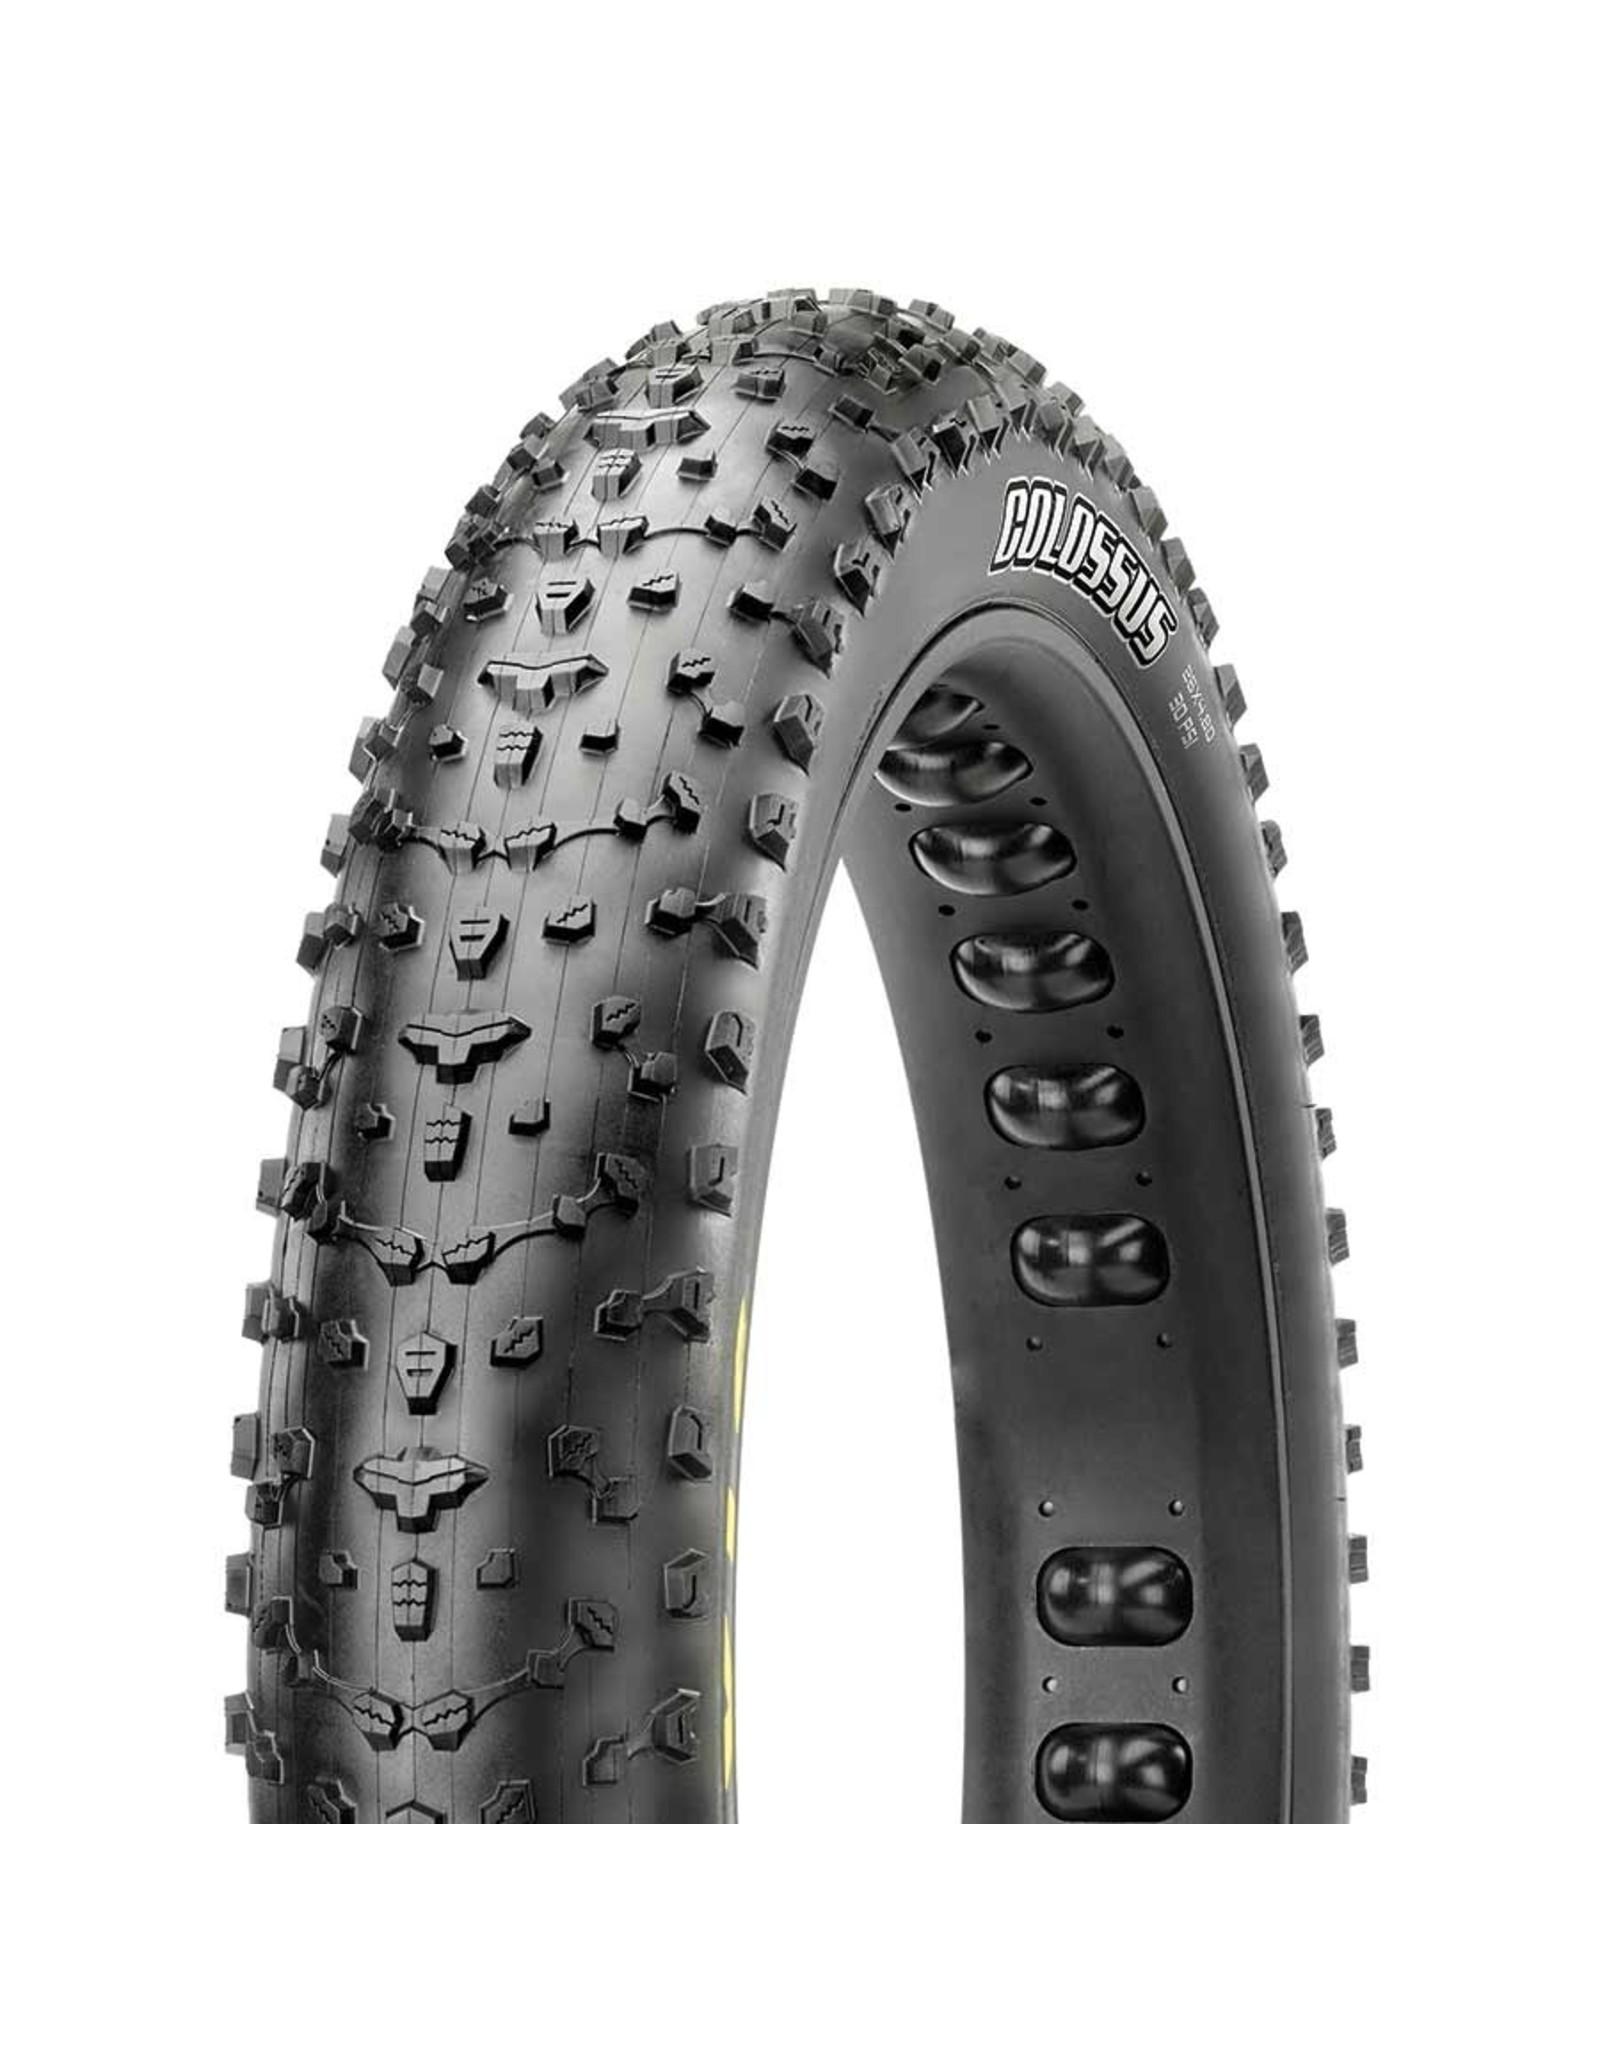 Maxxis Maxxis, Colossus, Tire, 27.5''x4.50, Folding, Tubeless Ready, Dual, EXO, 120TPI, Black